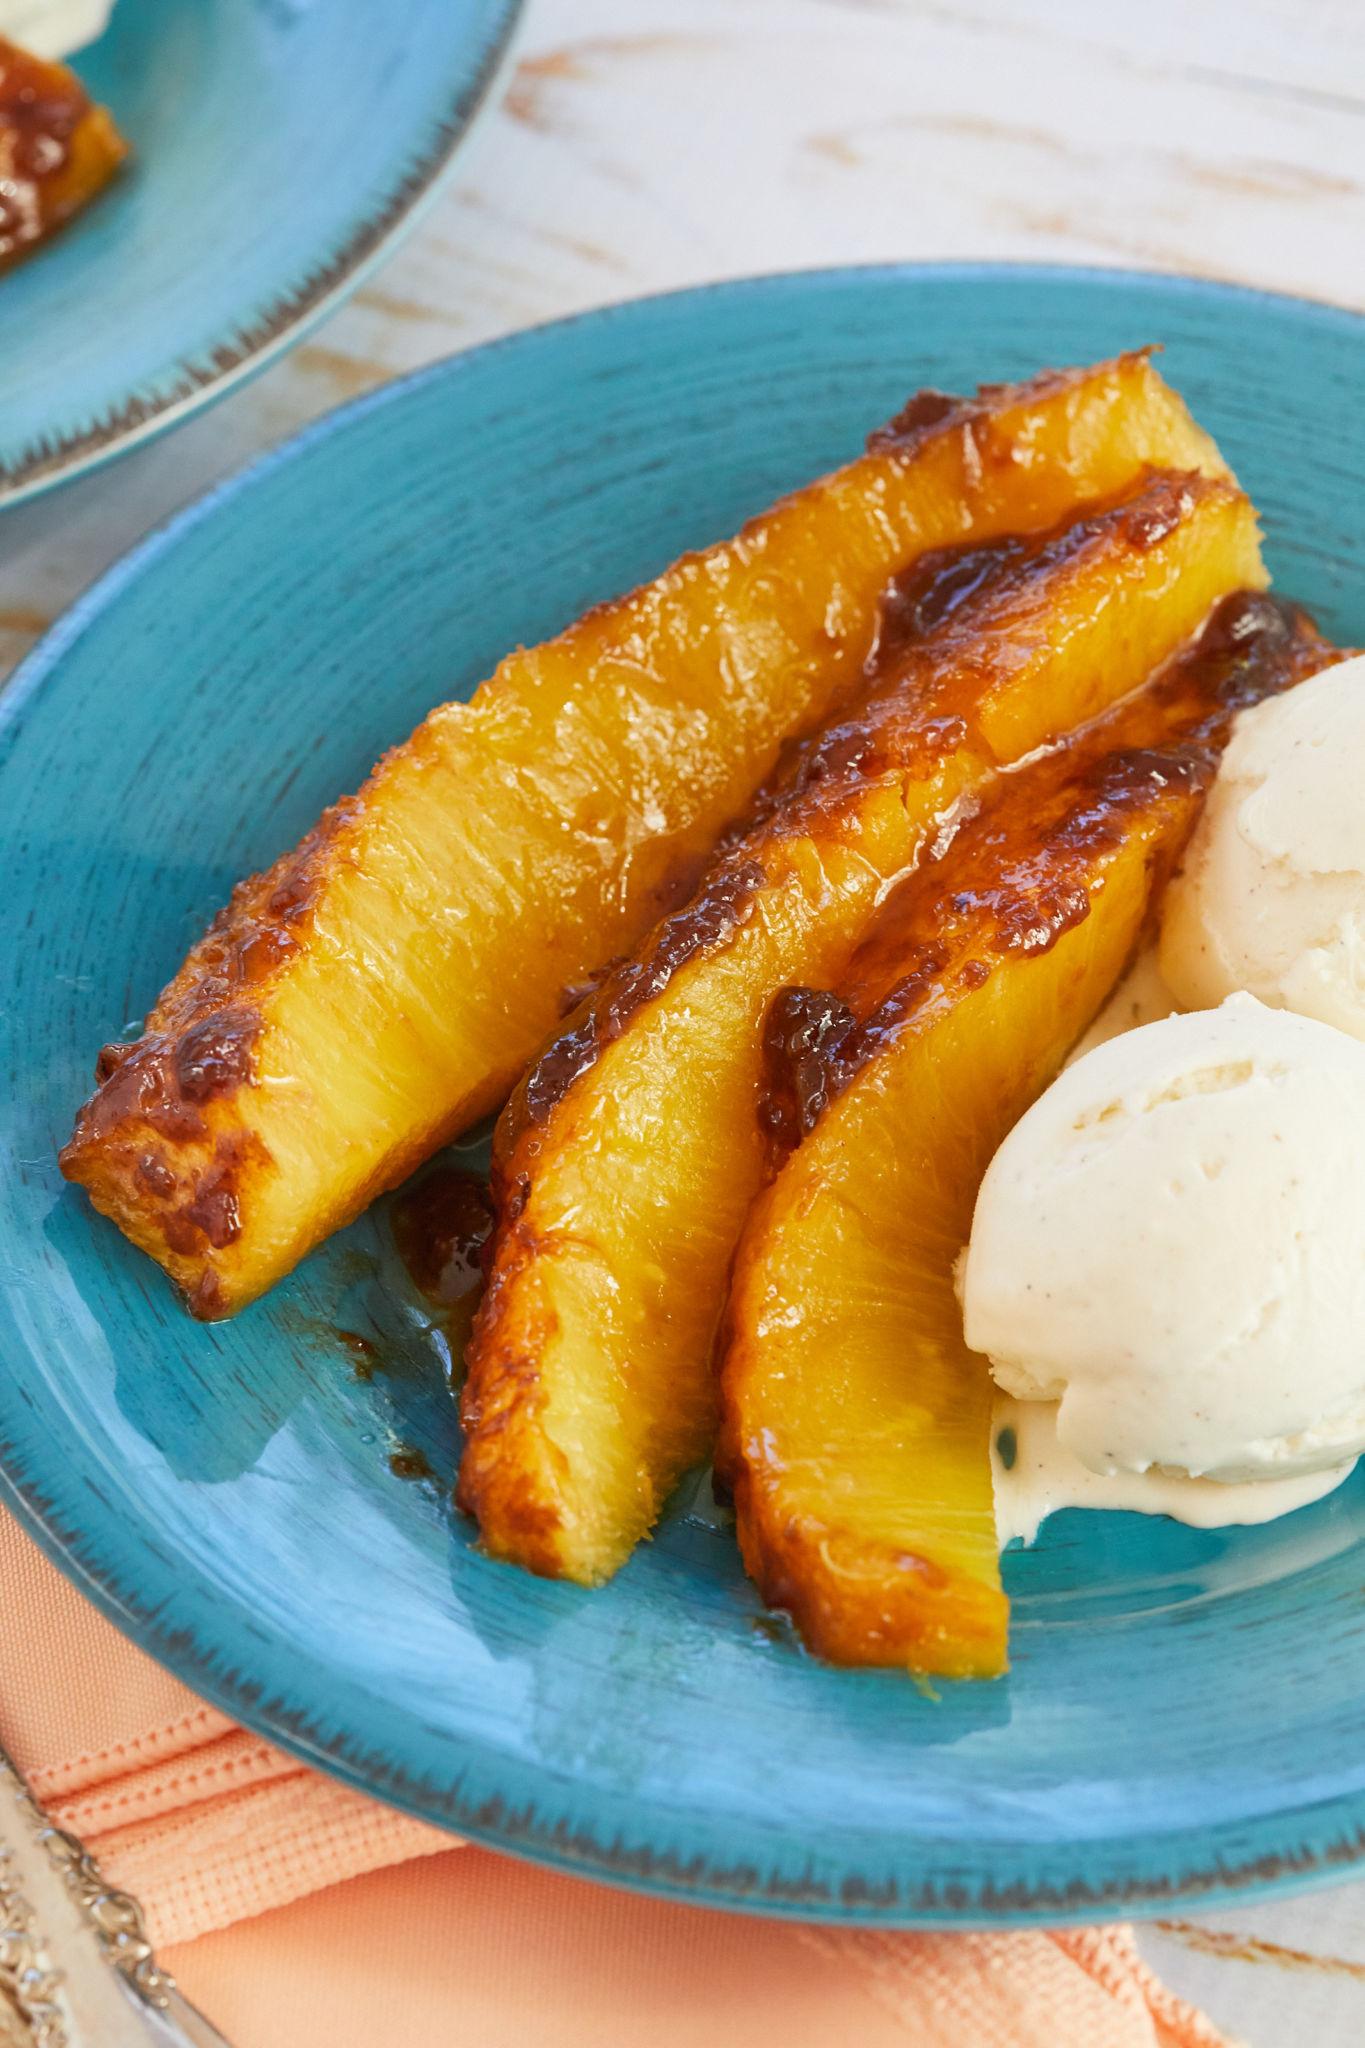 Slices of roasted pineapple with vanilla ice cream.